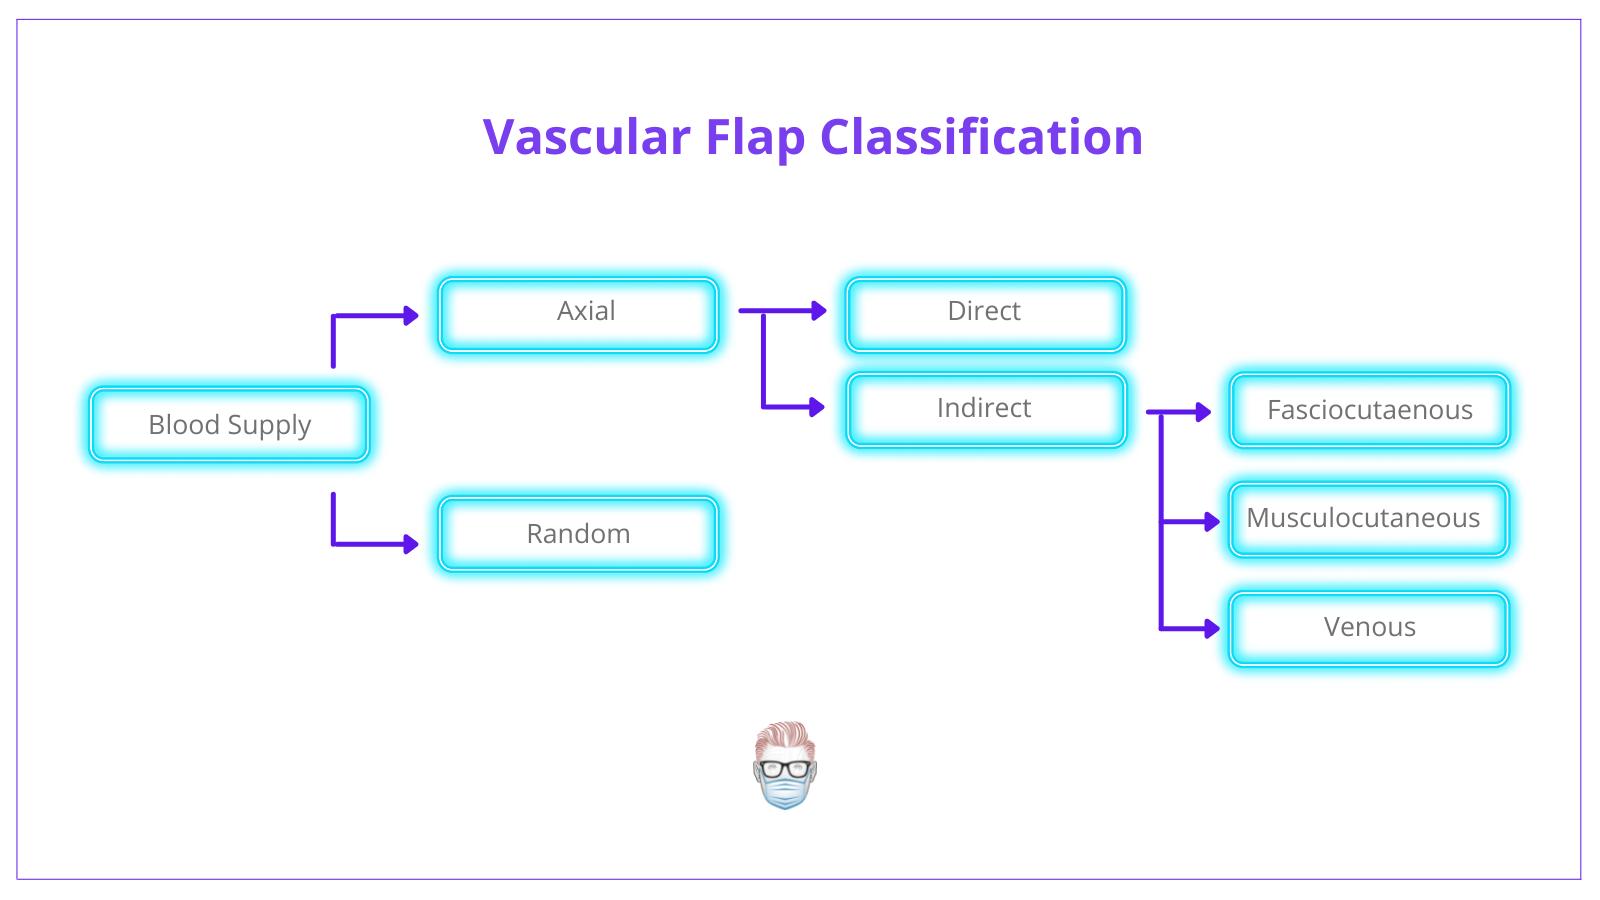 Vascular Flap Classification, Blood Supply, Flaps, Axial Flap, Random Flap, Fasciocutaenous Flap, Fasciocutaneous Flap, Musculocutaenous Flap, Musculocutaneous Flap